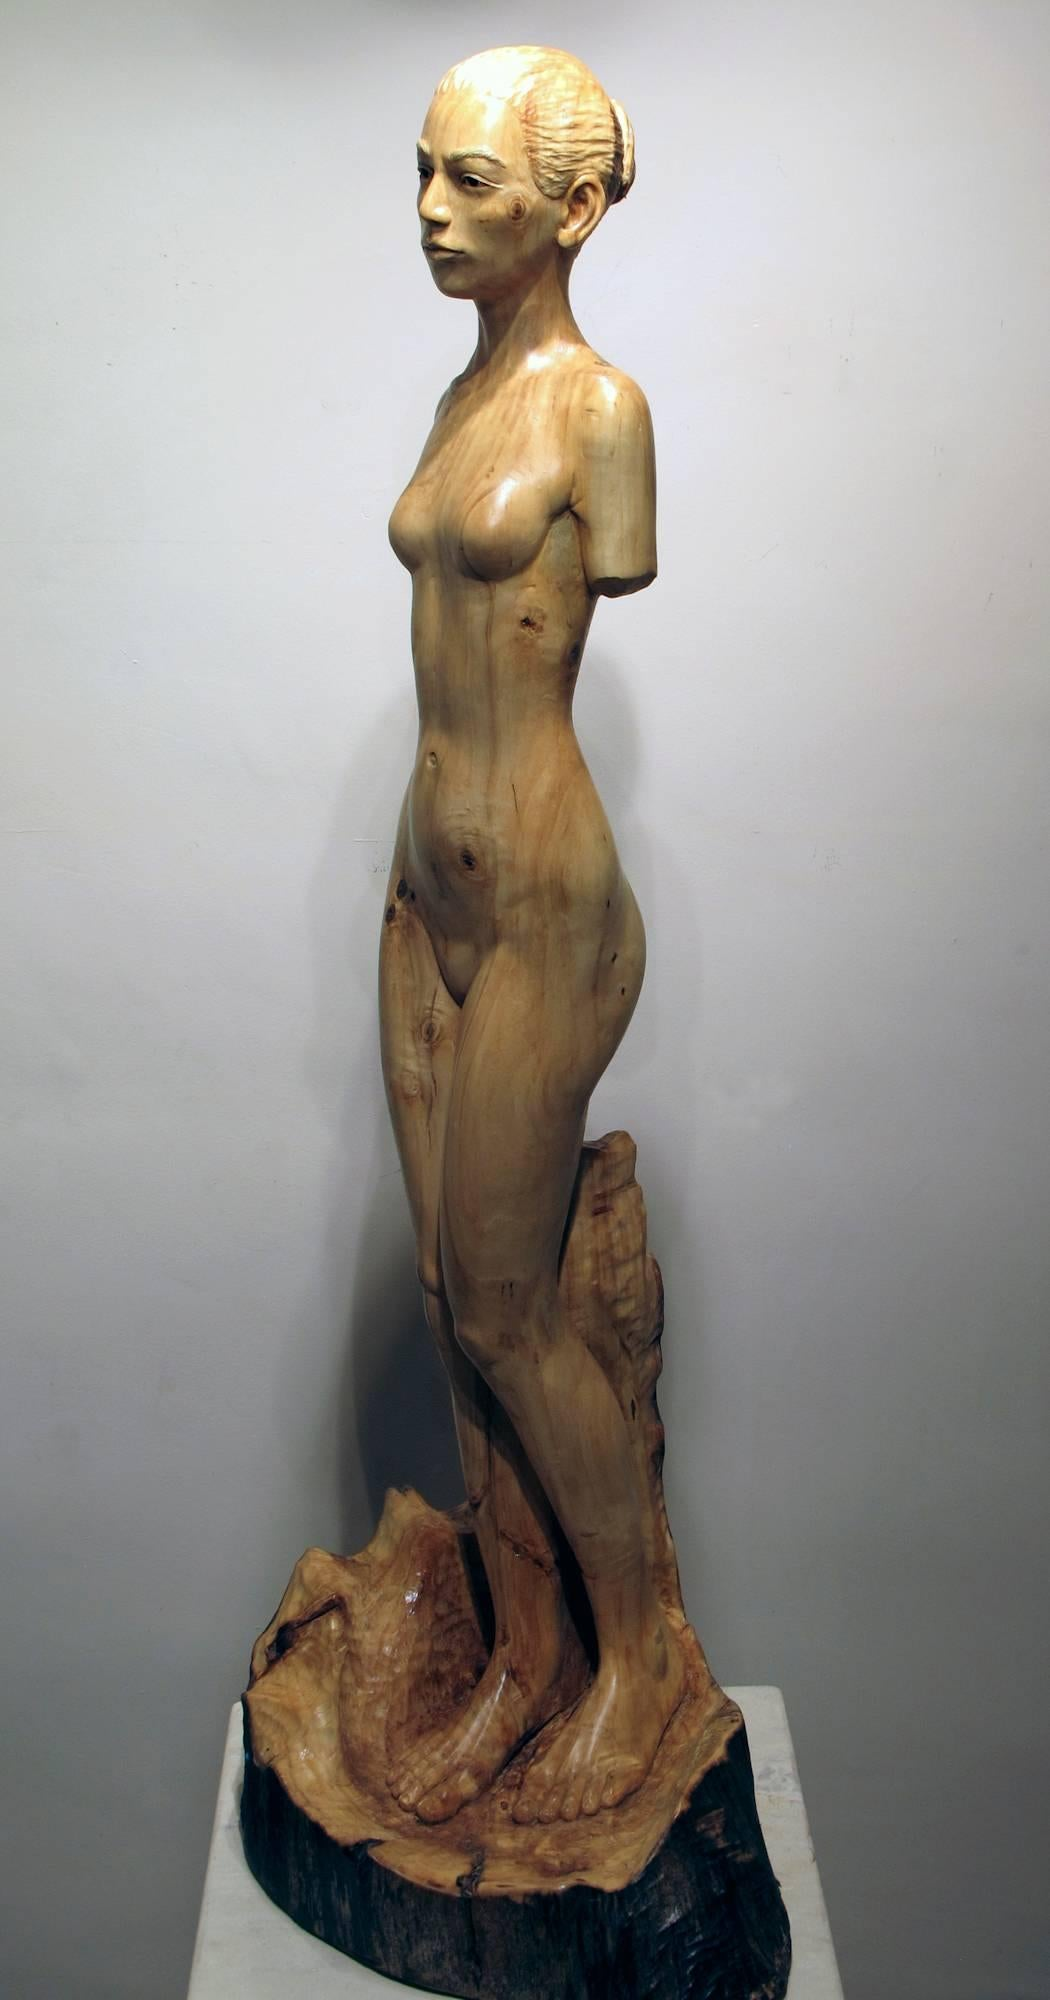 Tree Athena by Troy Williams female nude blonde wood sculpture Santa Fe artist